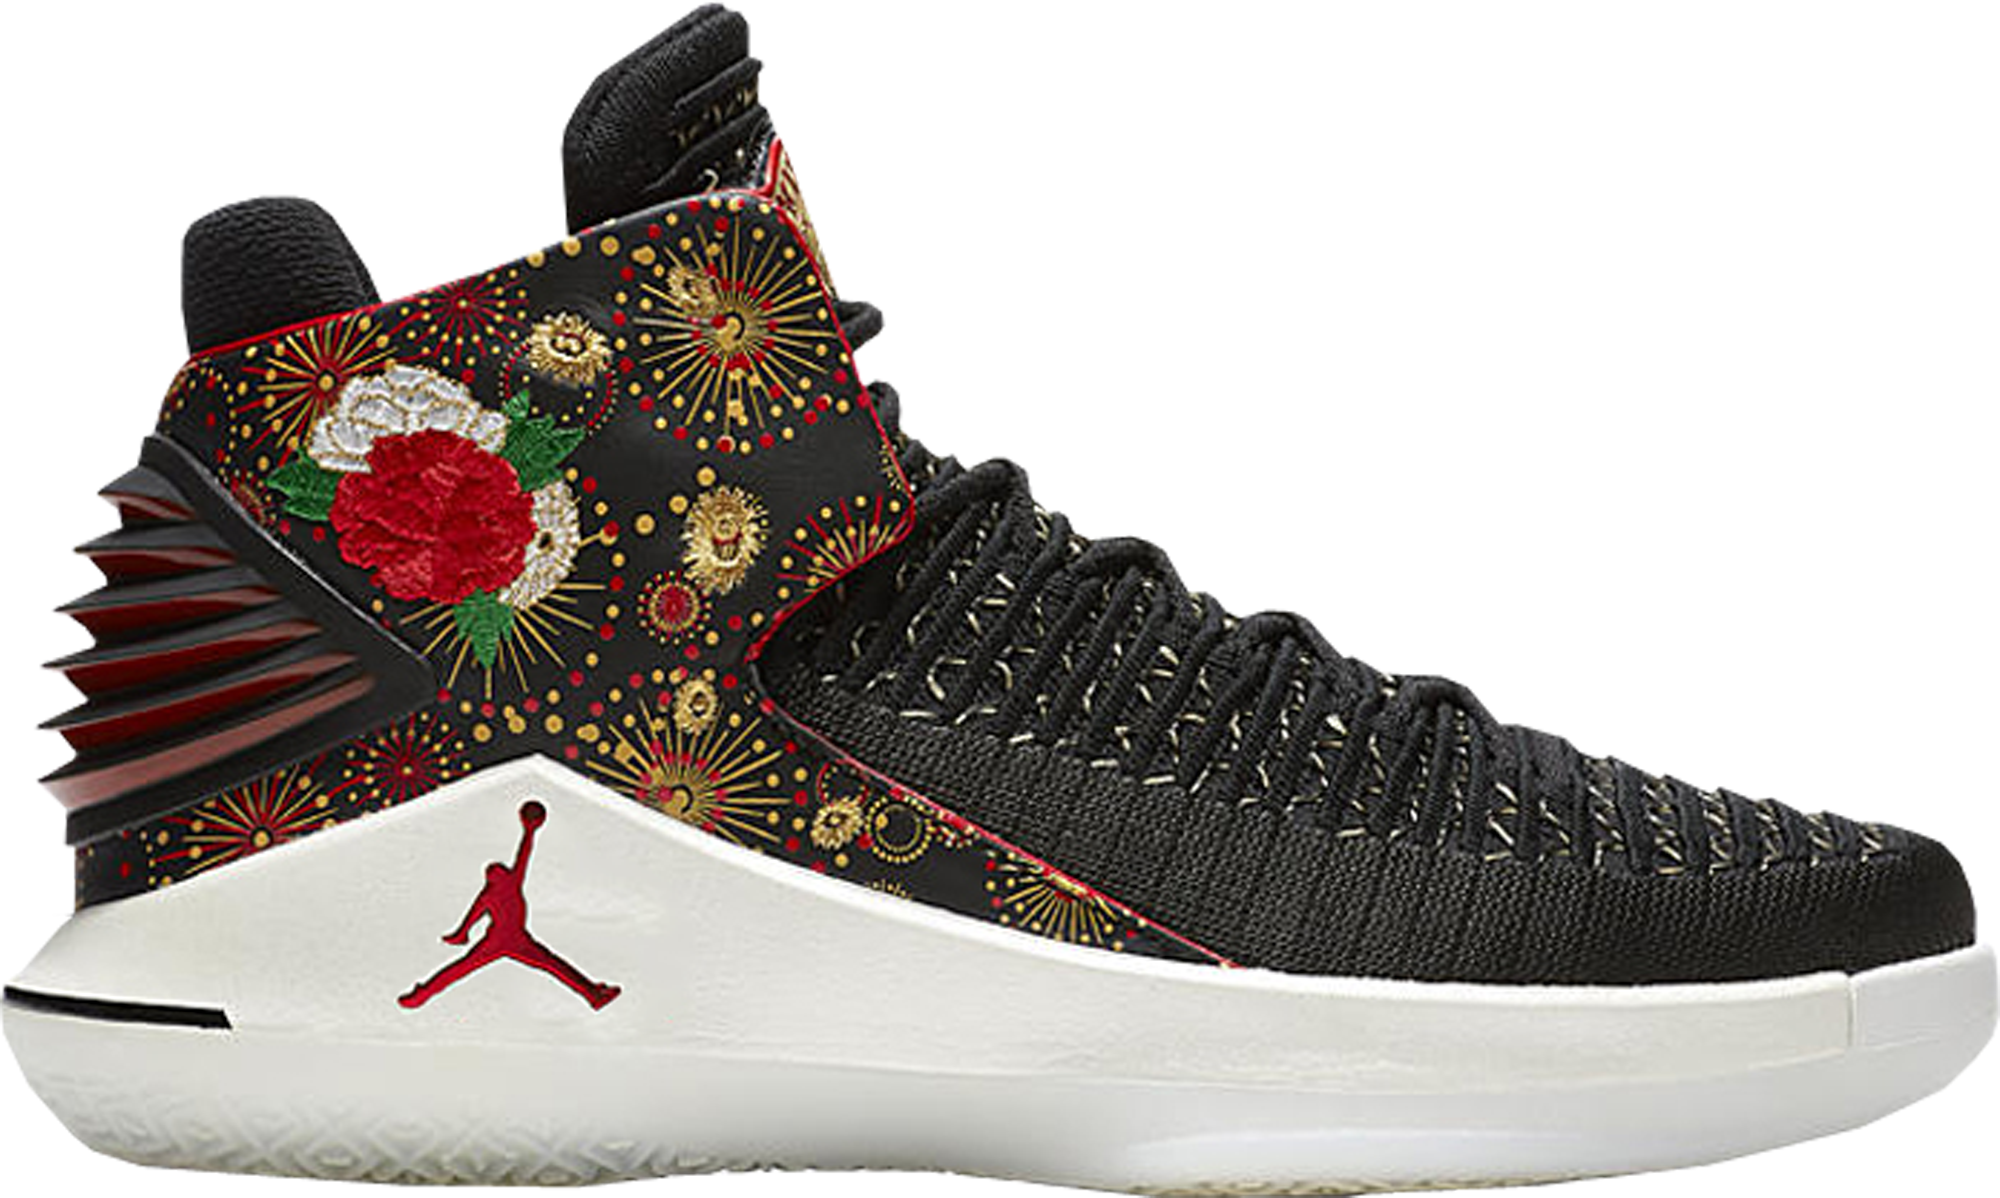 Jordan XXXII Chinese New Year (2018)